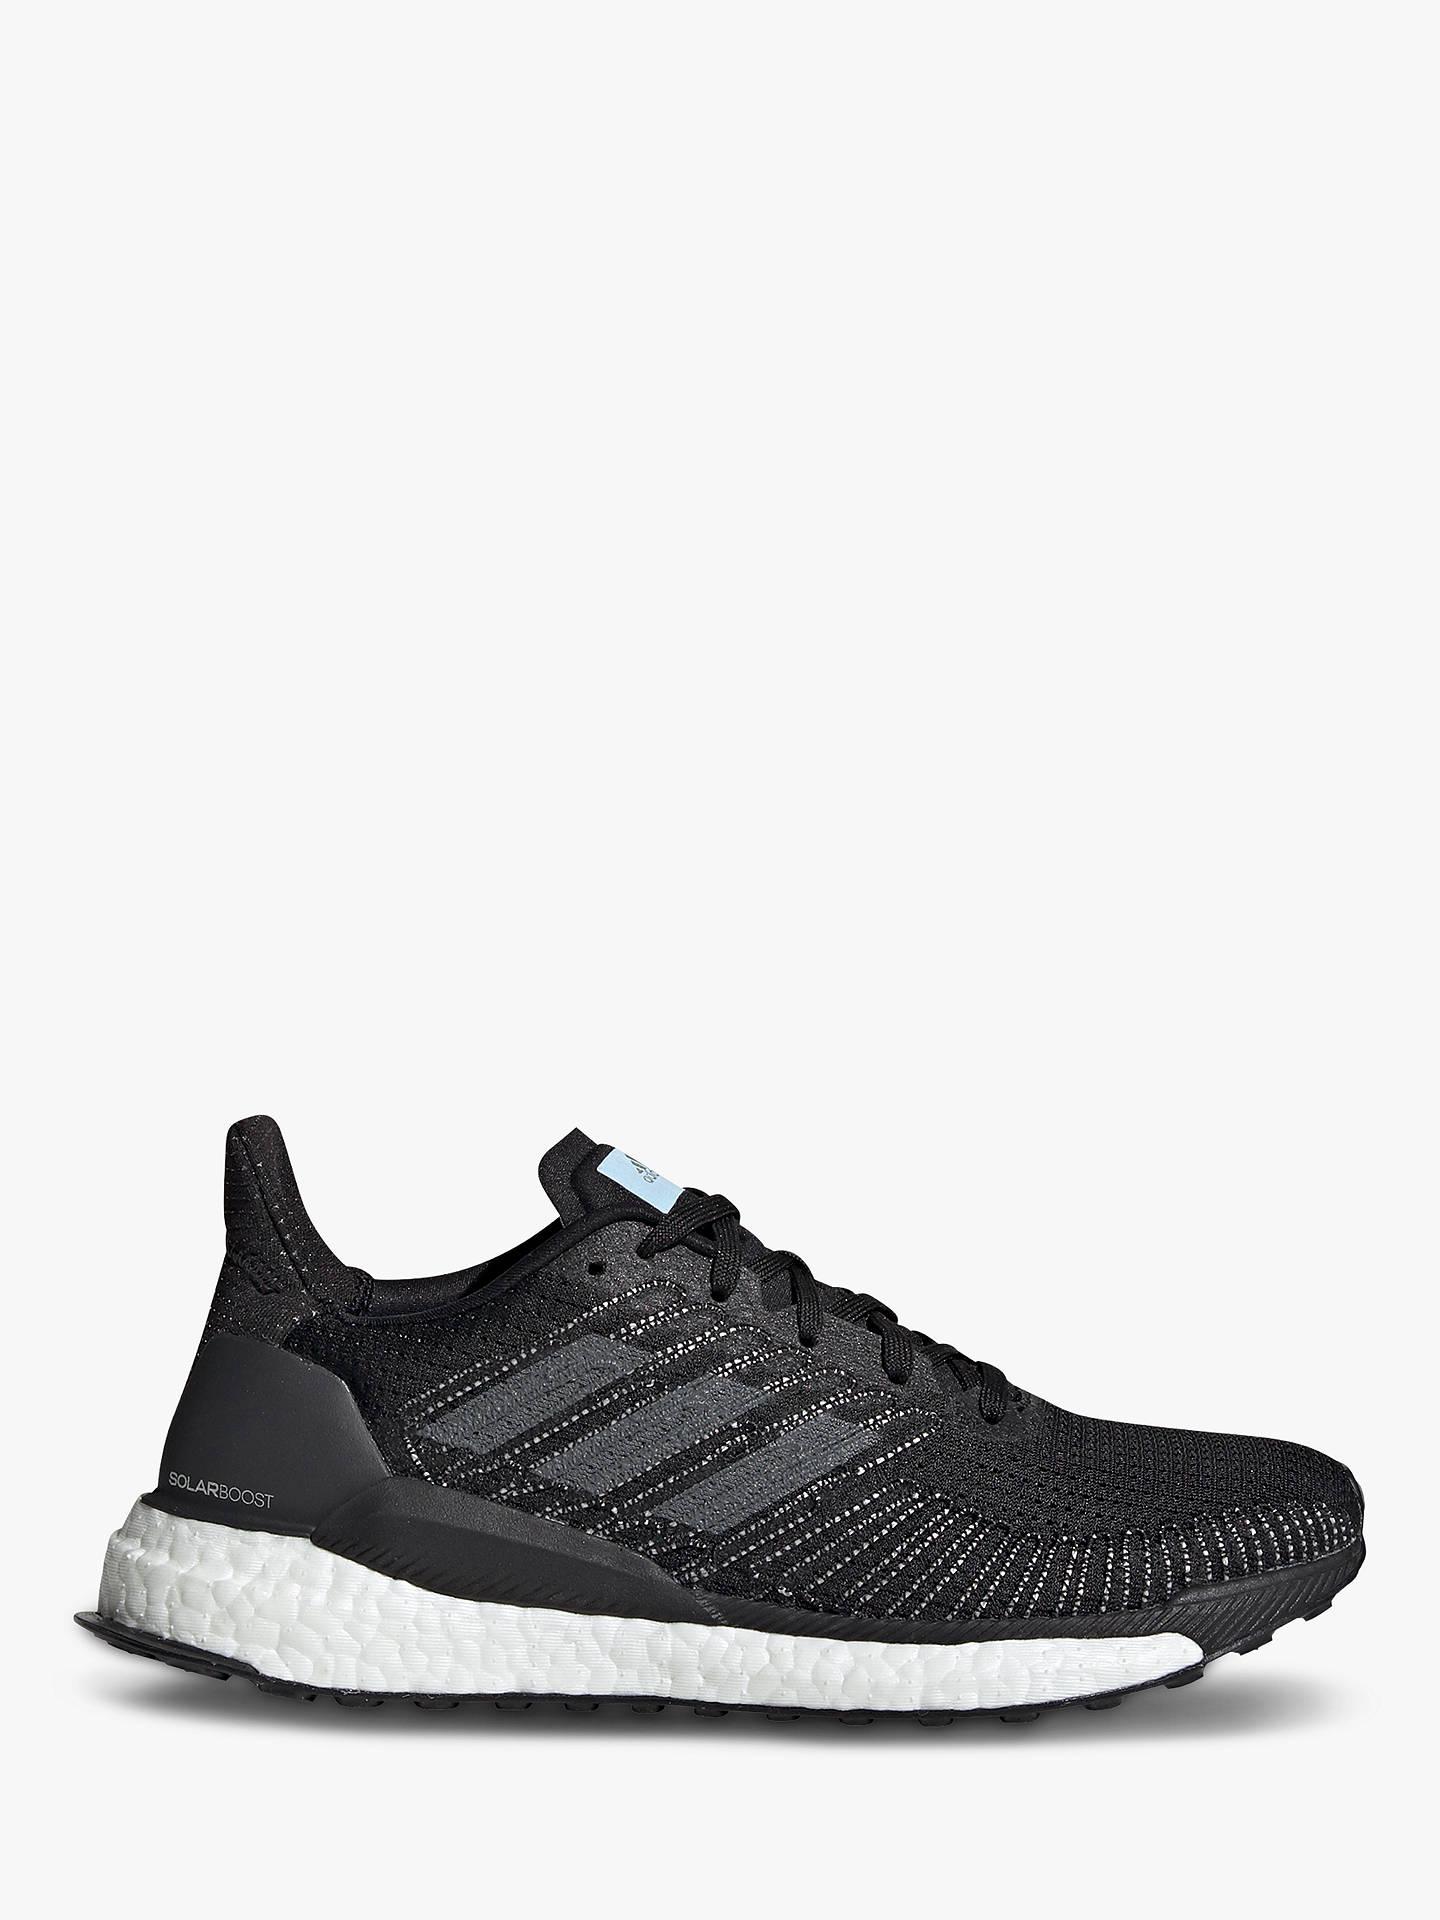 reputable site 1d793 b5261 adidas Solar Boost 19 Women's Running Shoes, Core Black/Grey Five/Glow Blue